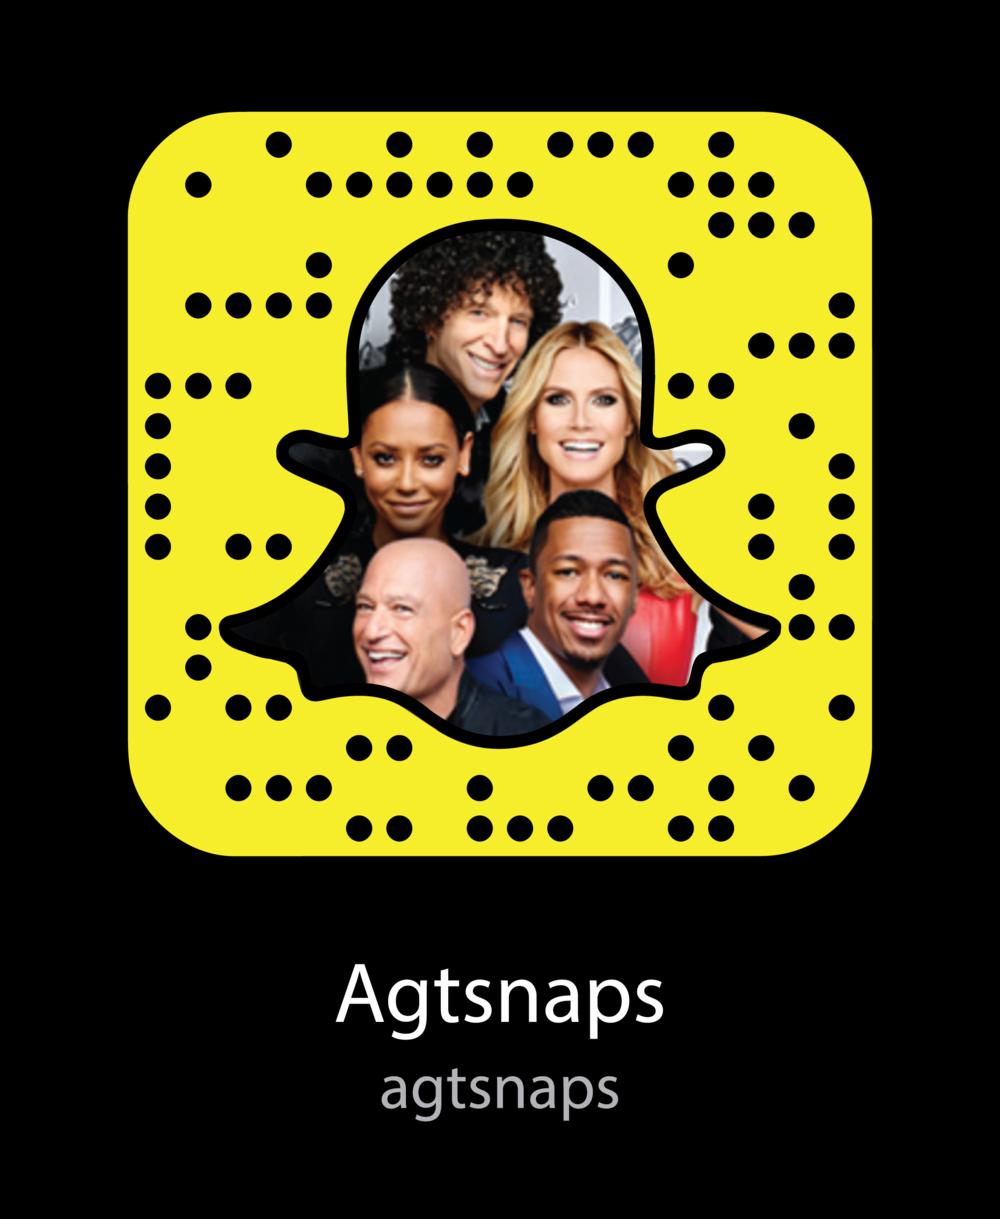 agtsnaps-Brands-snapchat-snapcode.png